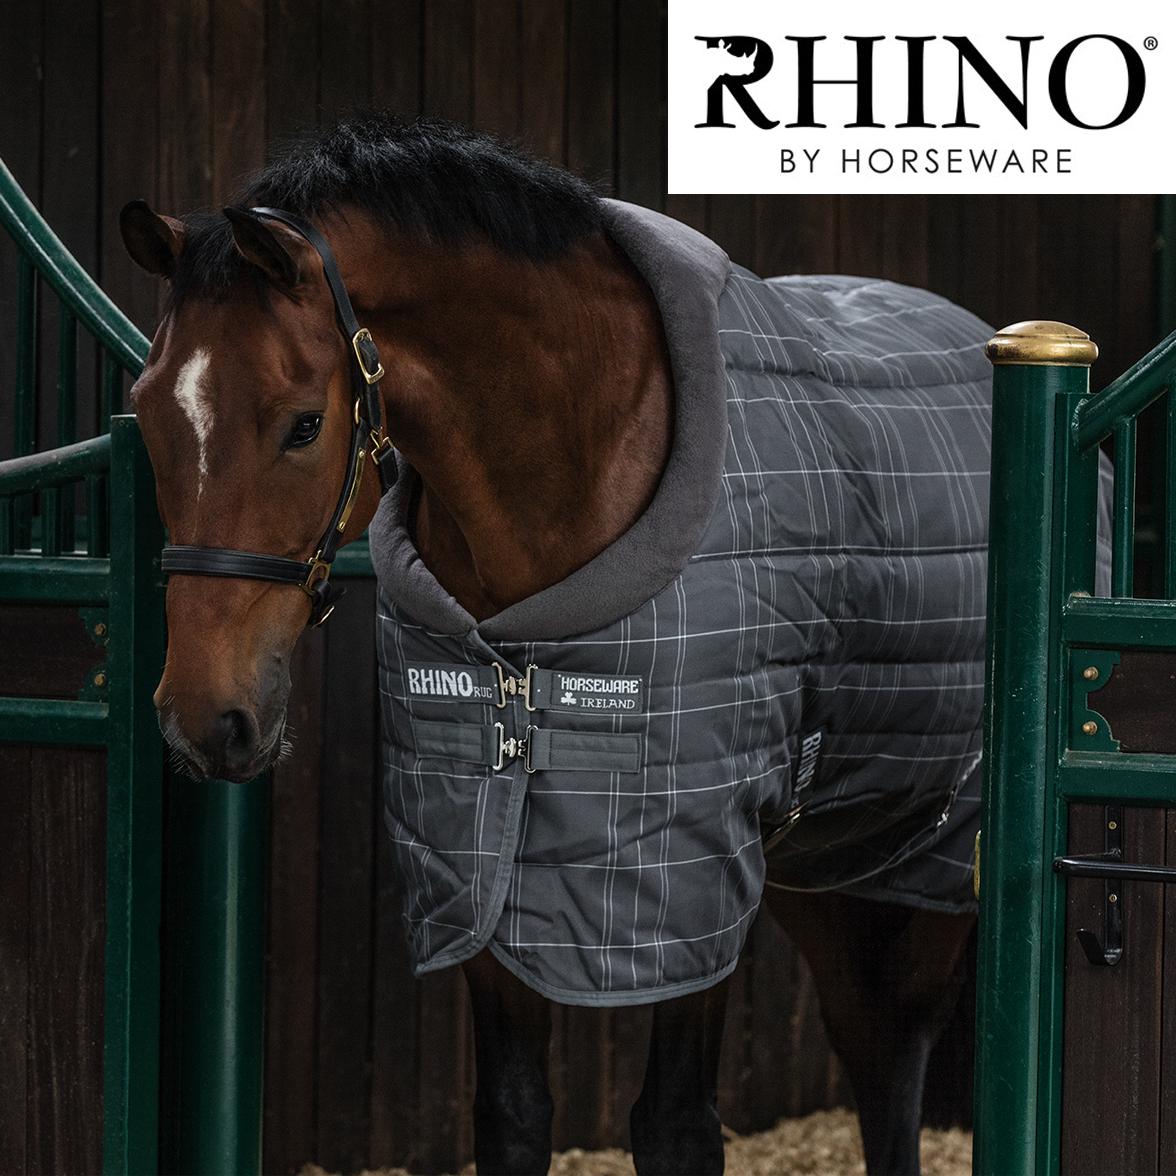 Horseware Rhino Original Medium Medium Original Stable Rug with Vari-Layer (Charcoal/Grau/Weiß 248427